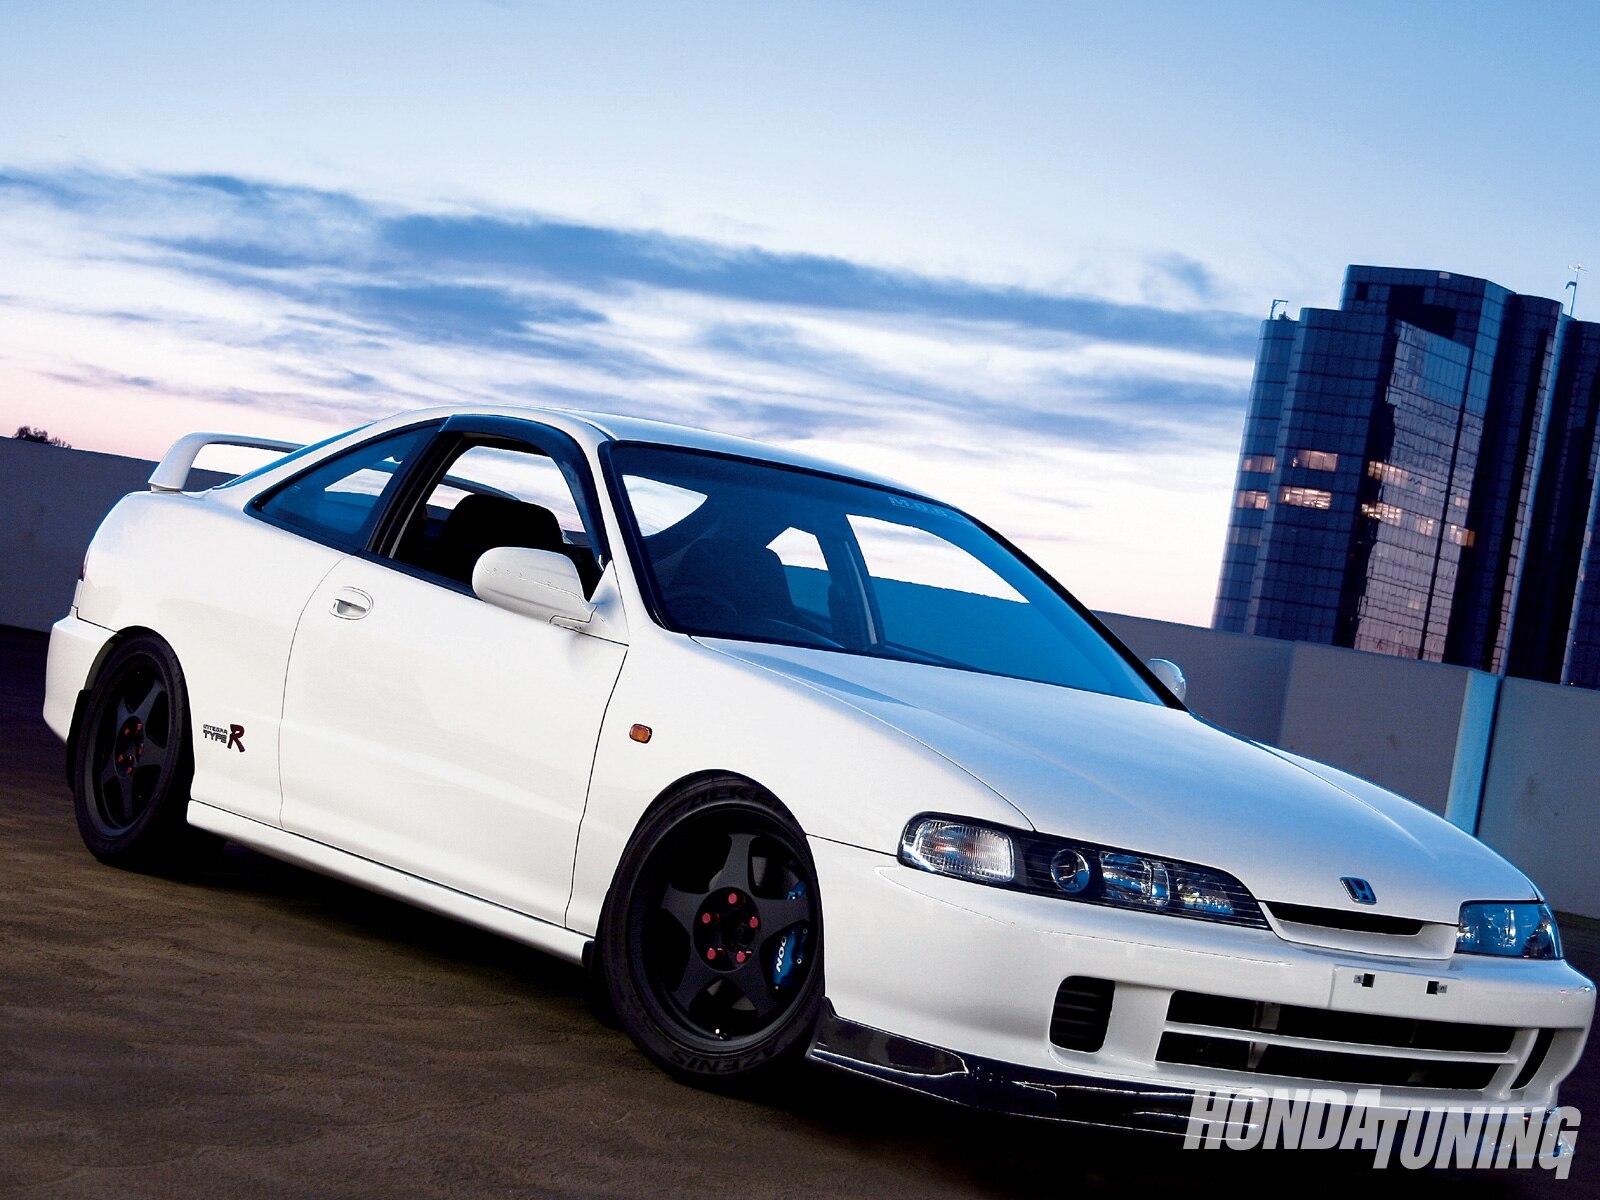 1997 Acura Integra Type R 2000 Jdm B18c Honda Tuning Magazine